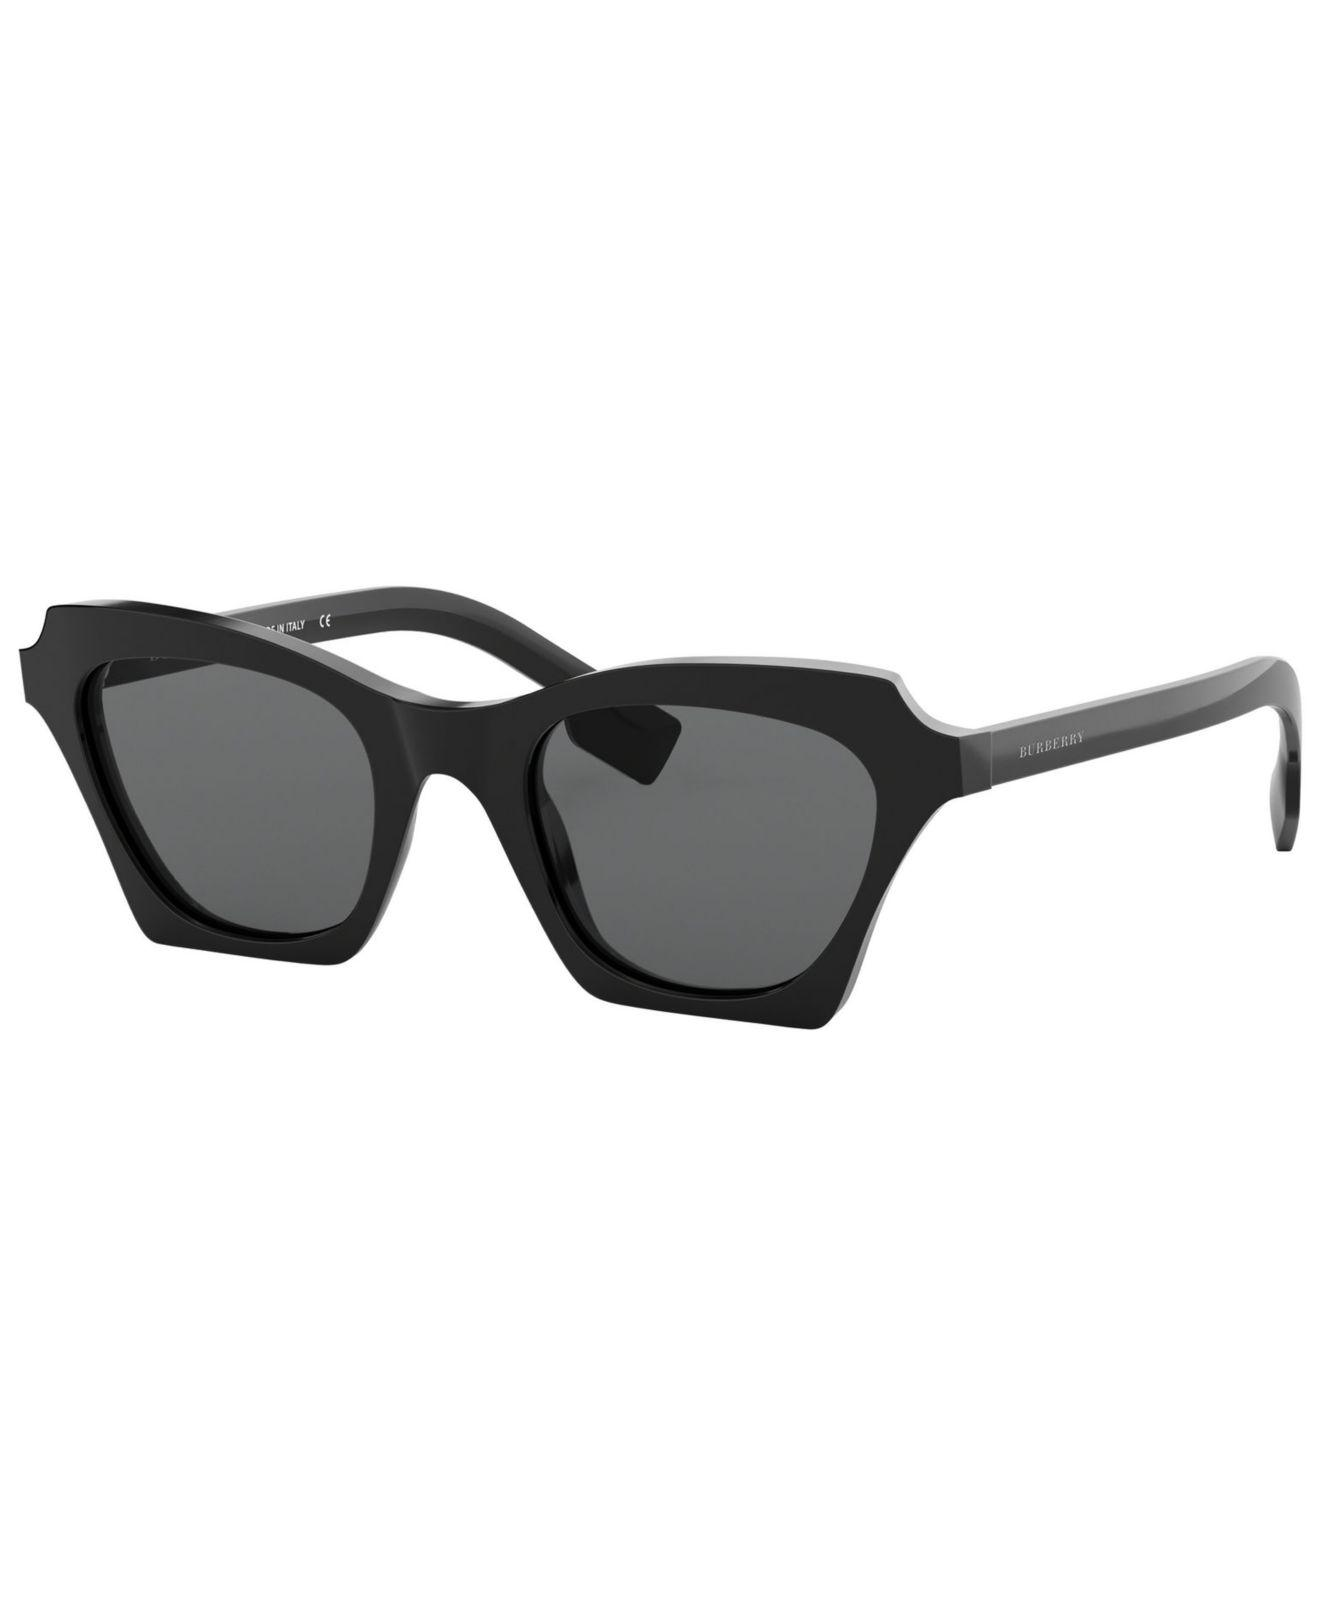 e90a734f140 Lyst - Burberry Be4283 in Black